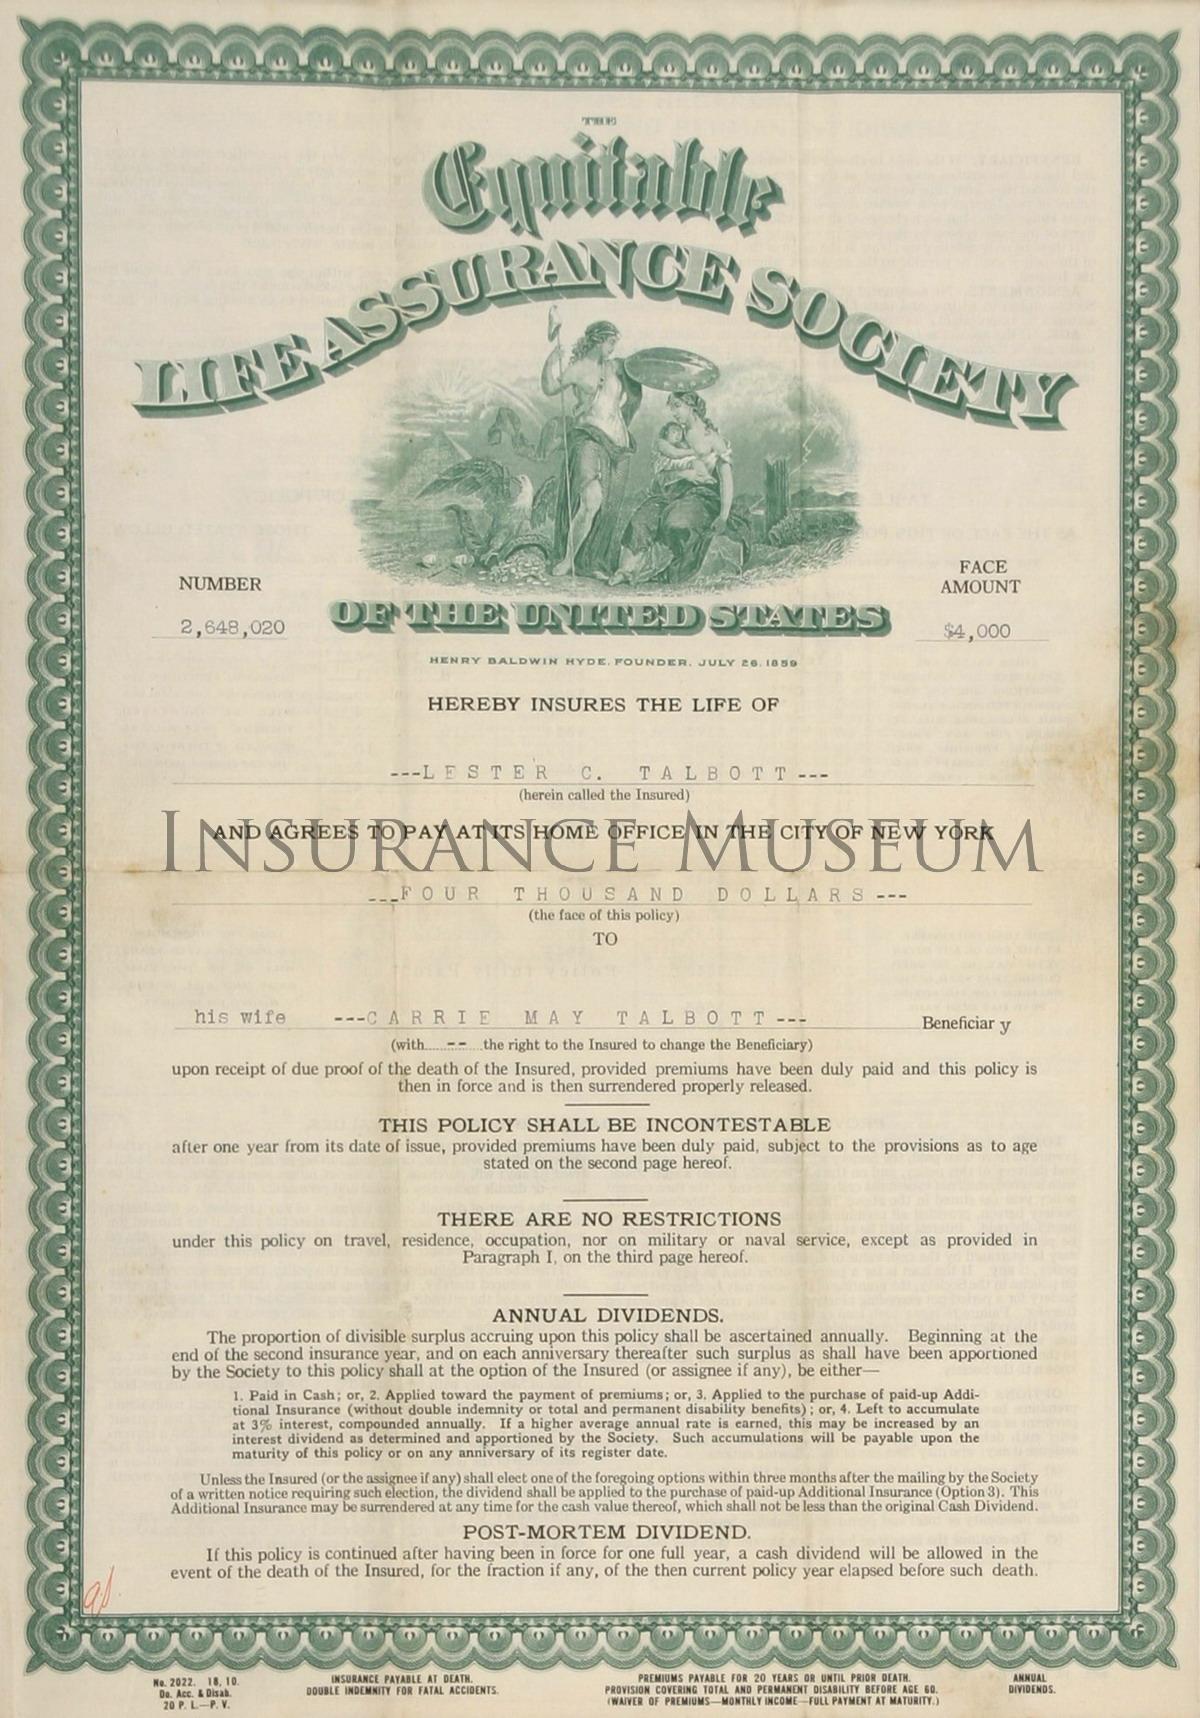 Equitable Life Assurance Society - 1920-07-21 - Policies ...